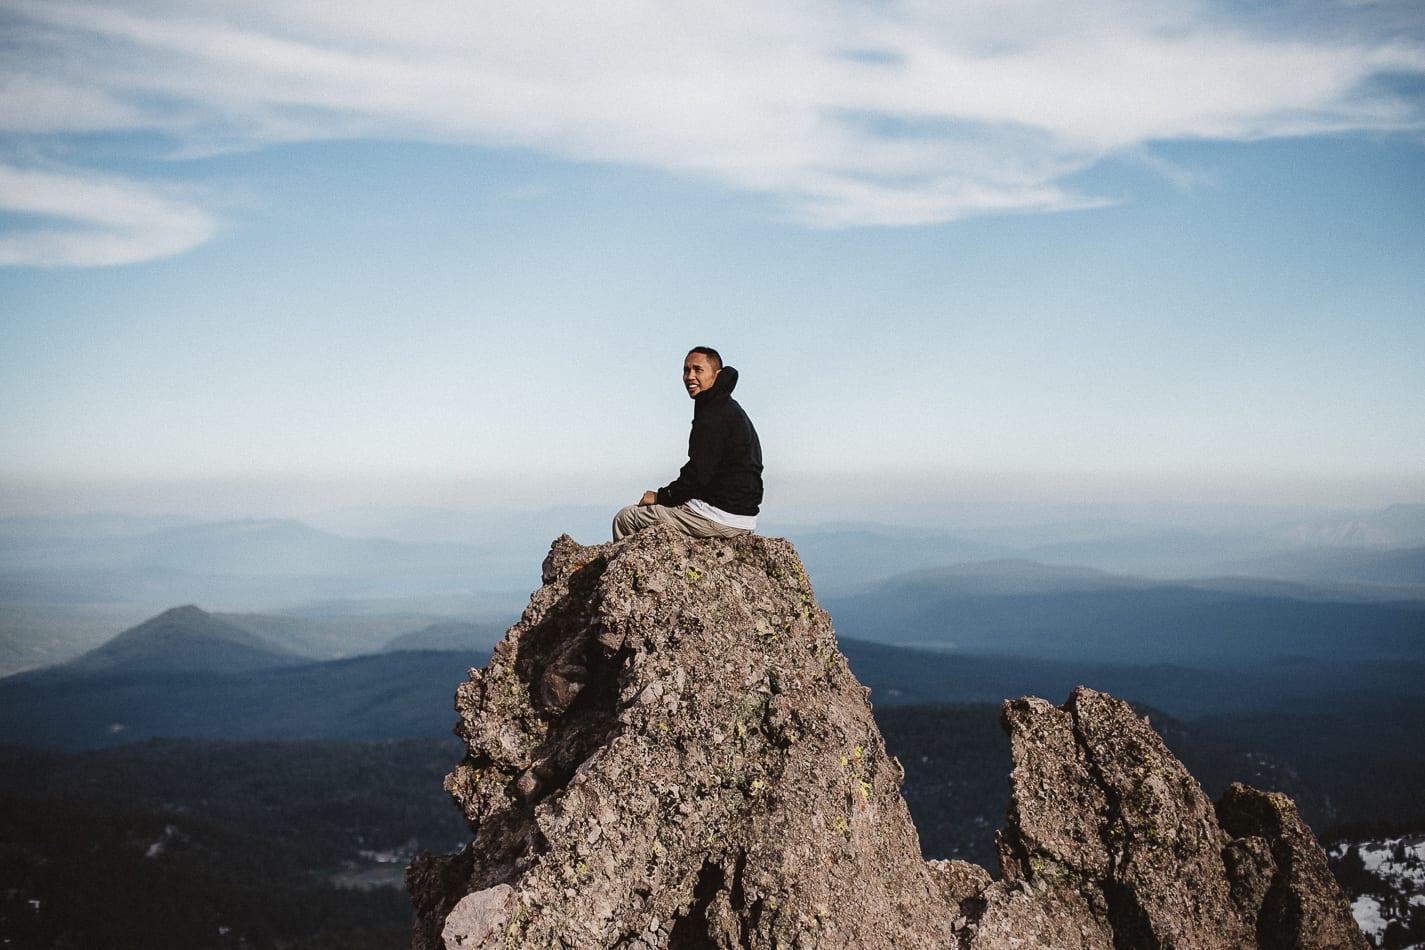 mount-lassen-california-adventure-lifestyle-photorapher-21